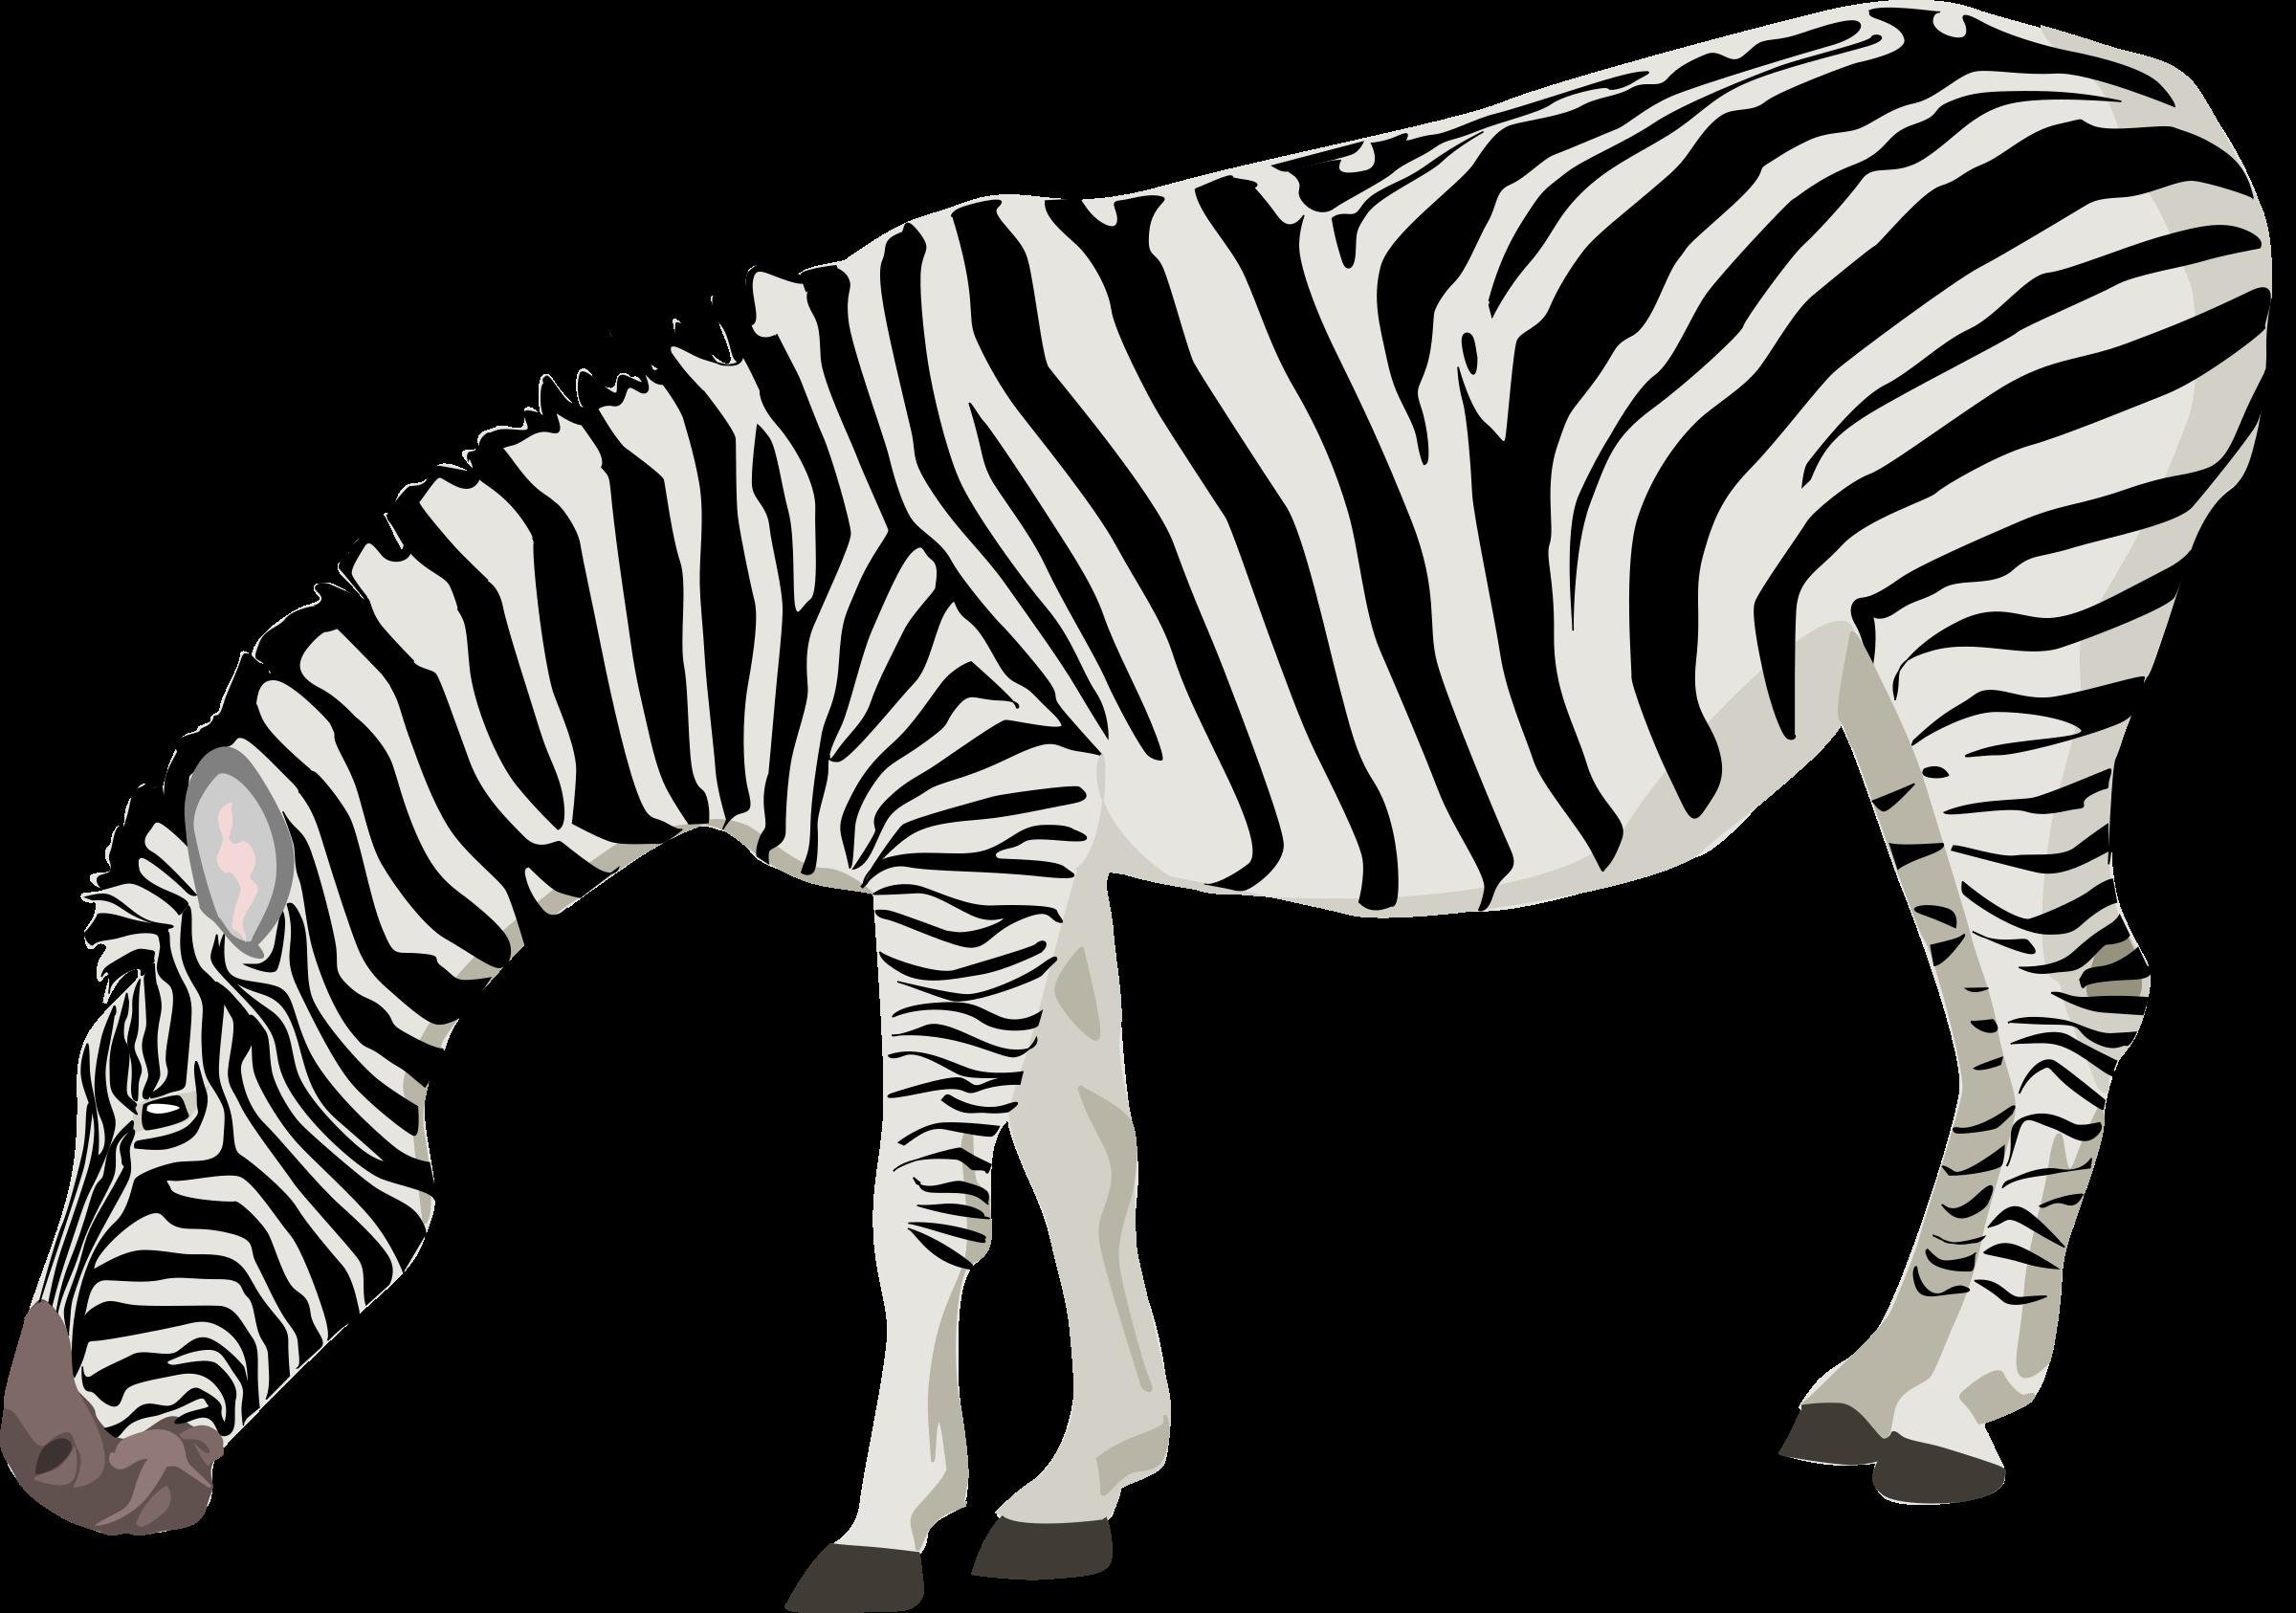 clipart transparent download Zebra clipart. File free on dumielauxepices.